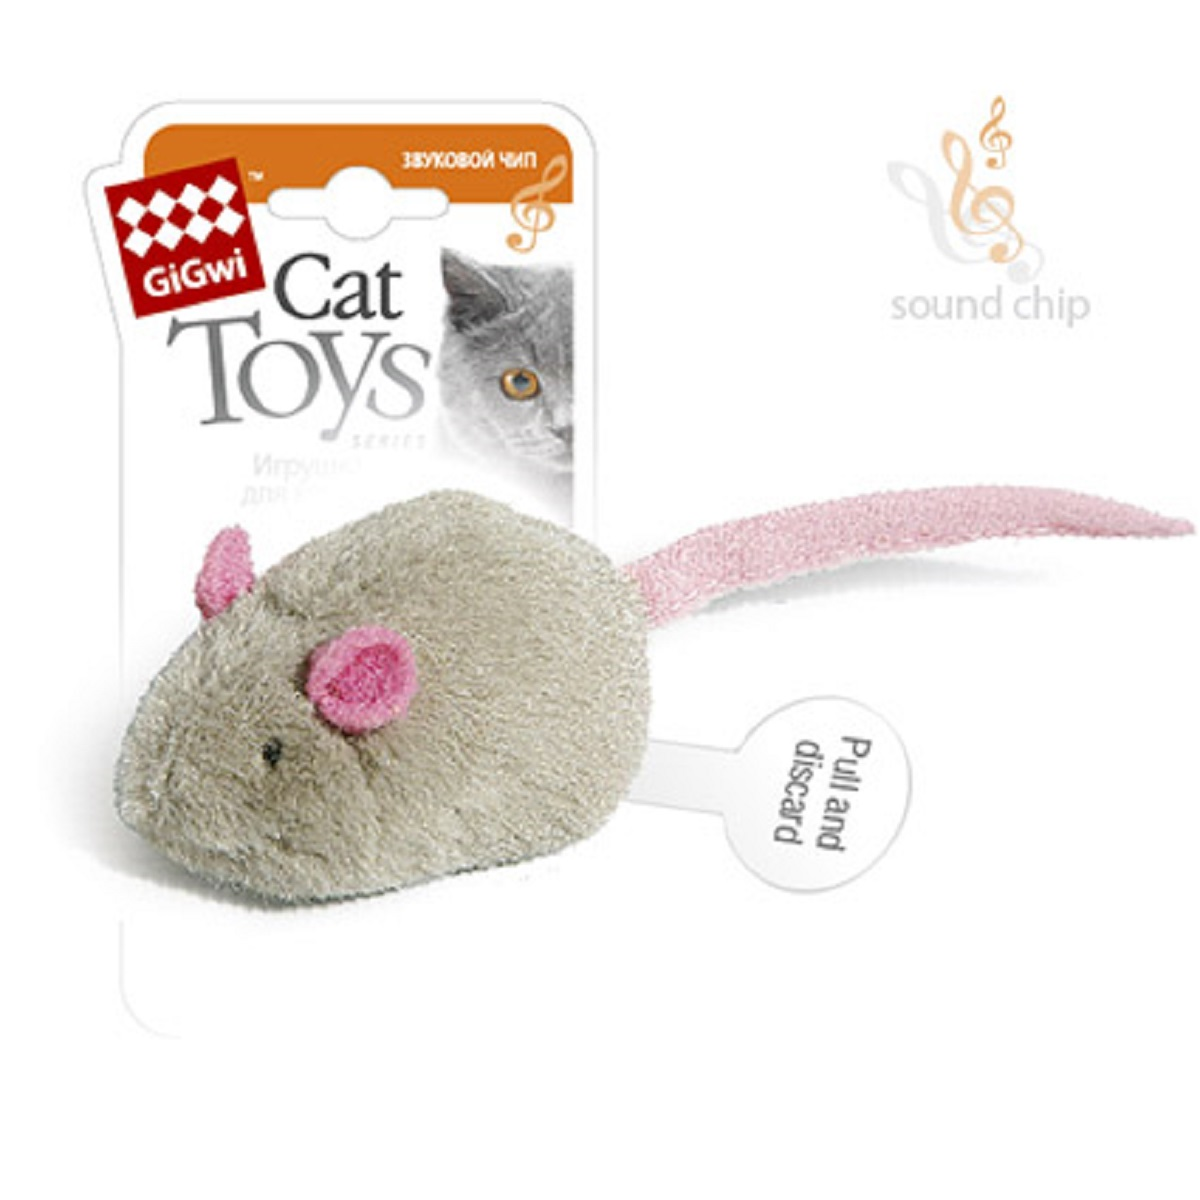 Игрушка для кошек GiGwi Мышка с электронным чипом электронная игрушка для кошек gigwi pet droid фезер воблер